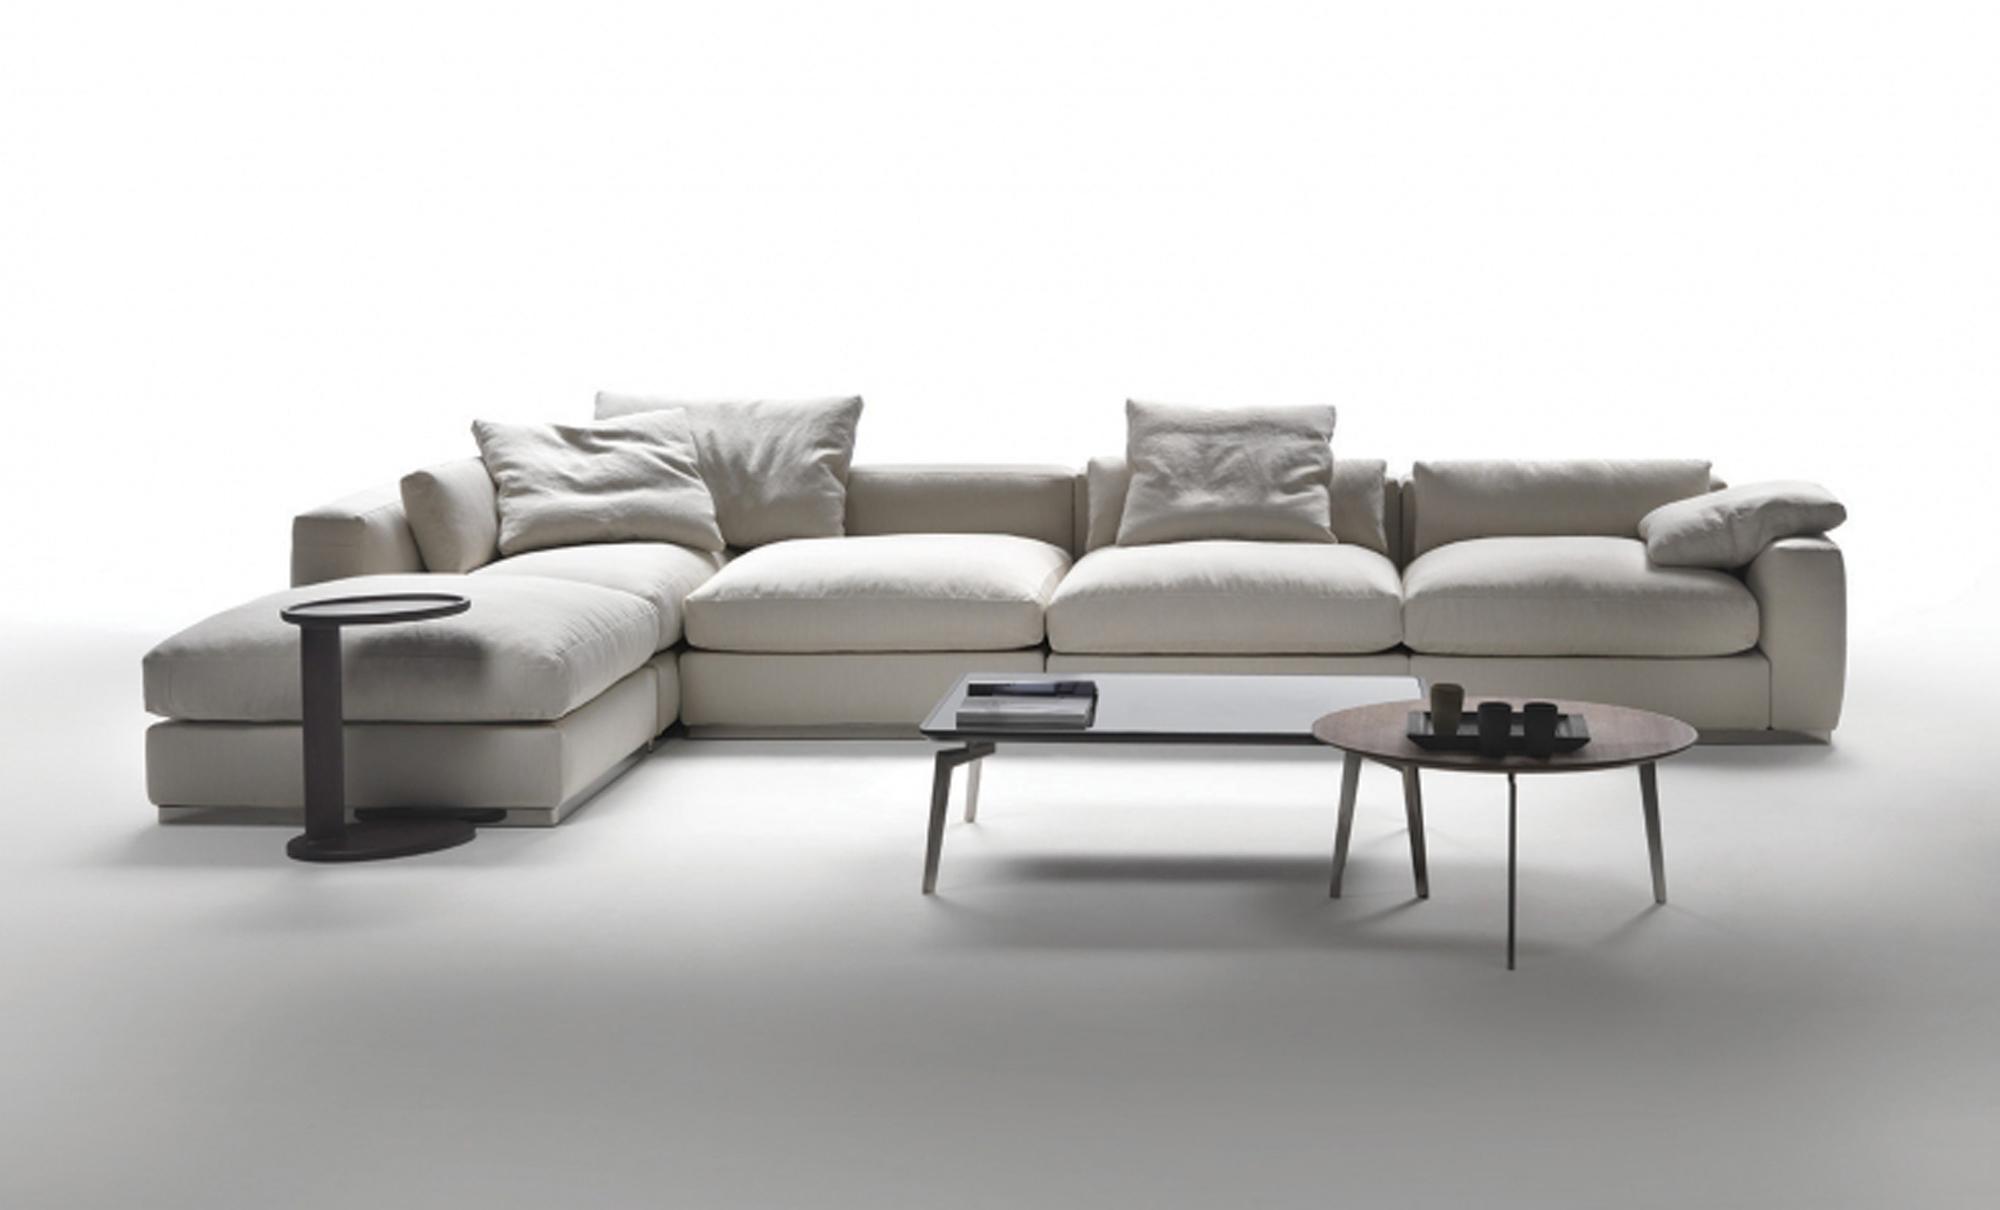 beauty sofas fanuli furniture. Black Bedroom Furniture Sets. Home Design Ideas